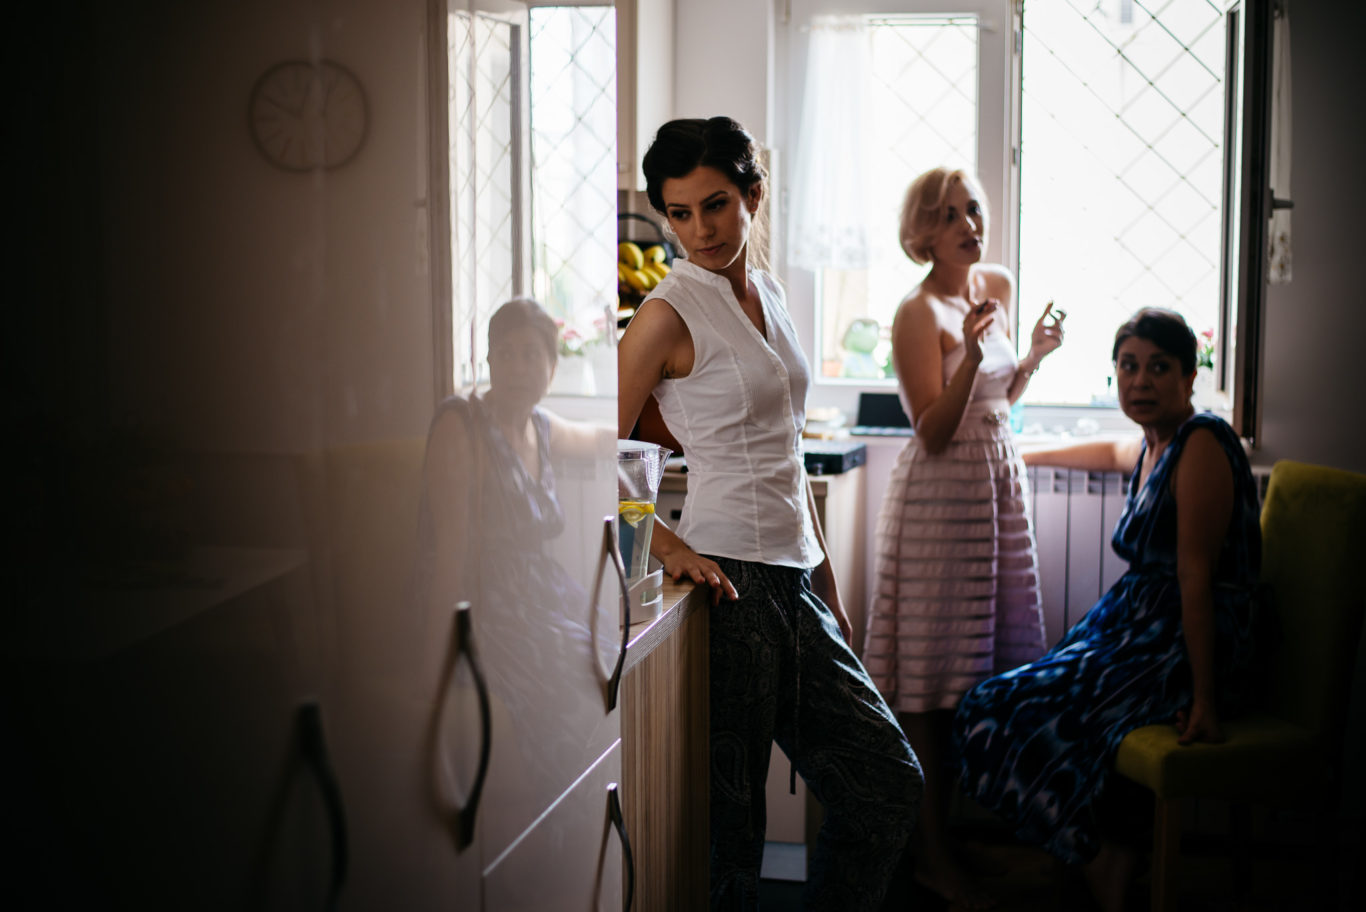 0074-Fotografie-nunta-Bucuresti-Oana-Catalin-fotograf-Ciprian-Dumitrescu-DSC_3555